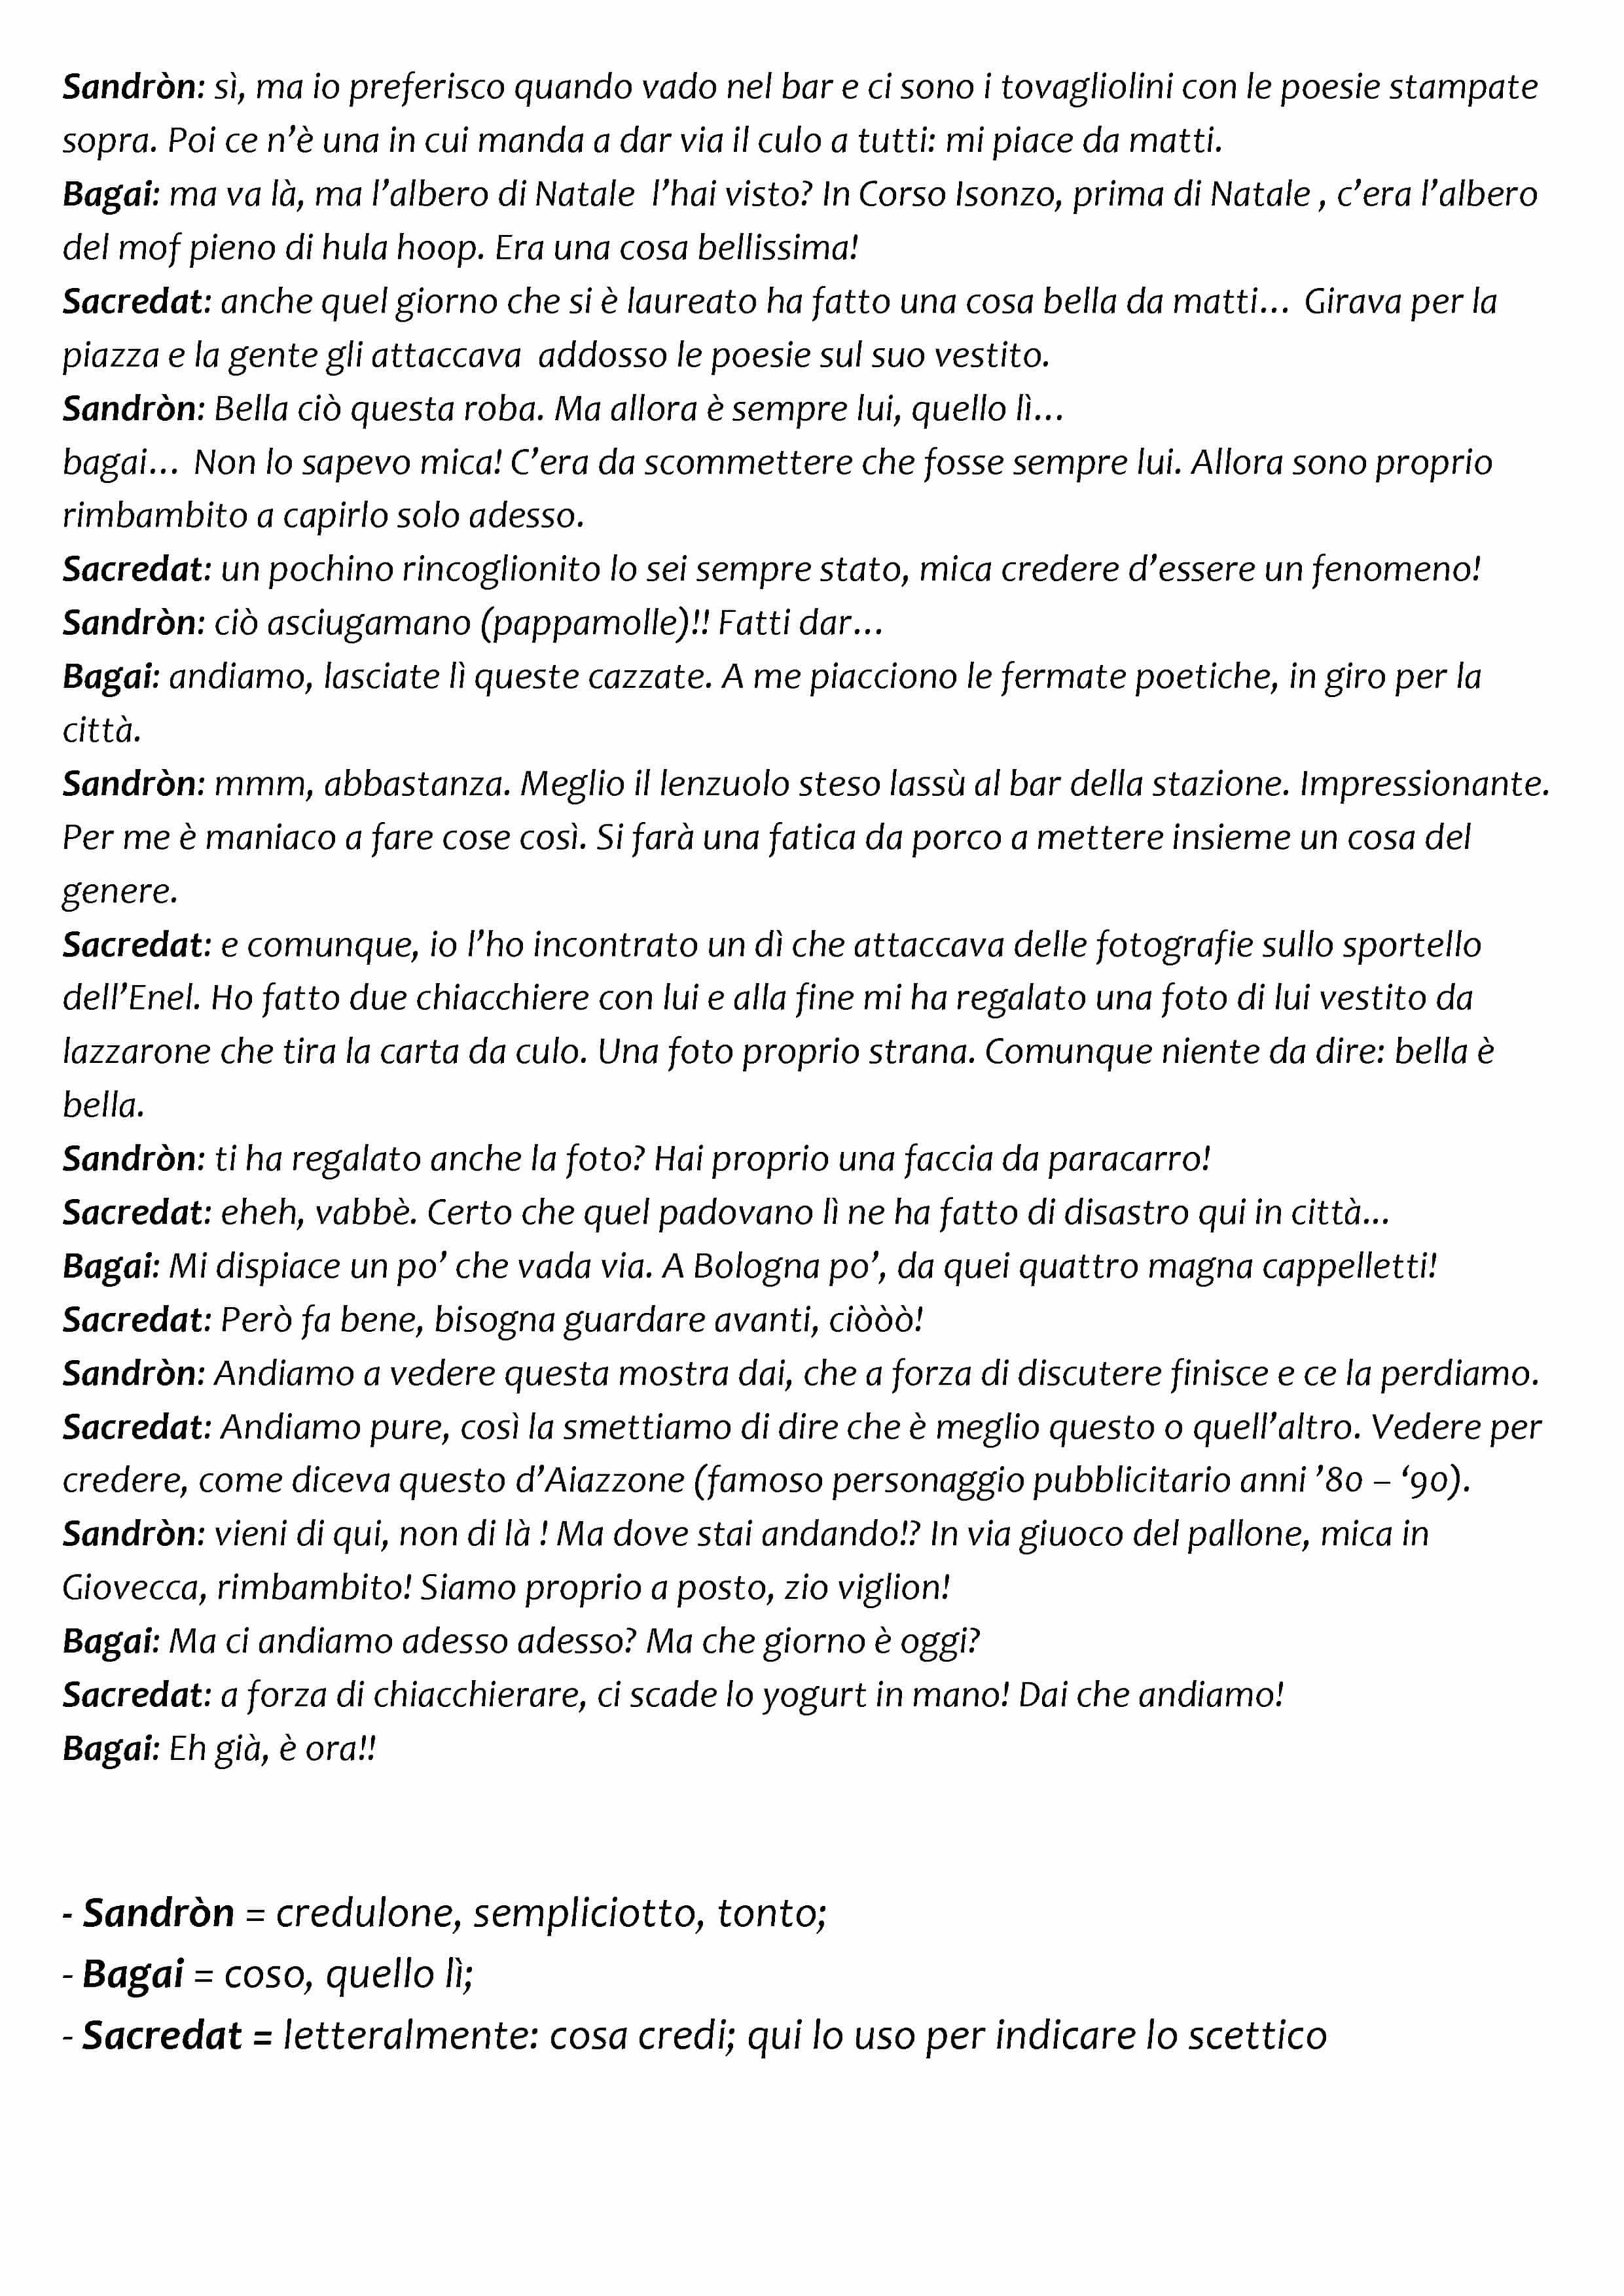 traduzione 2